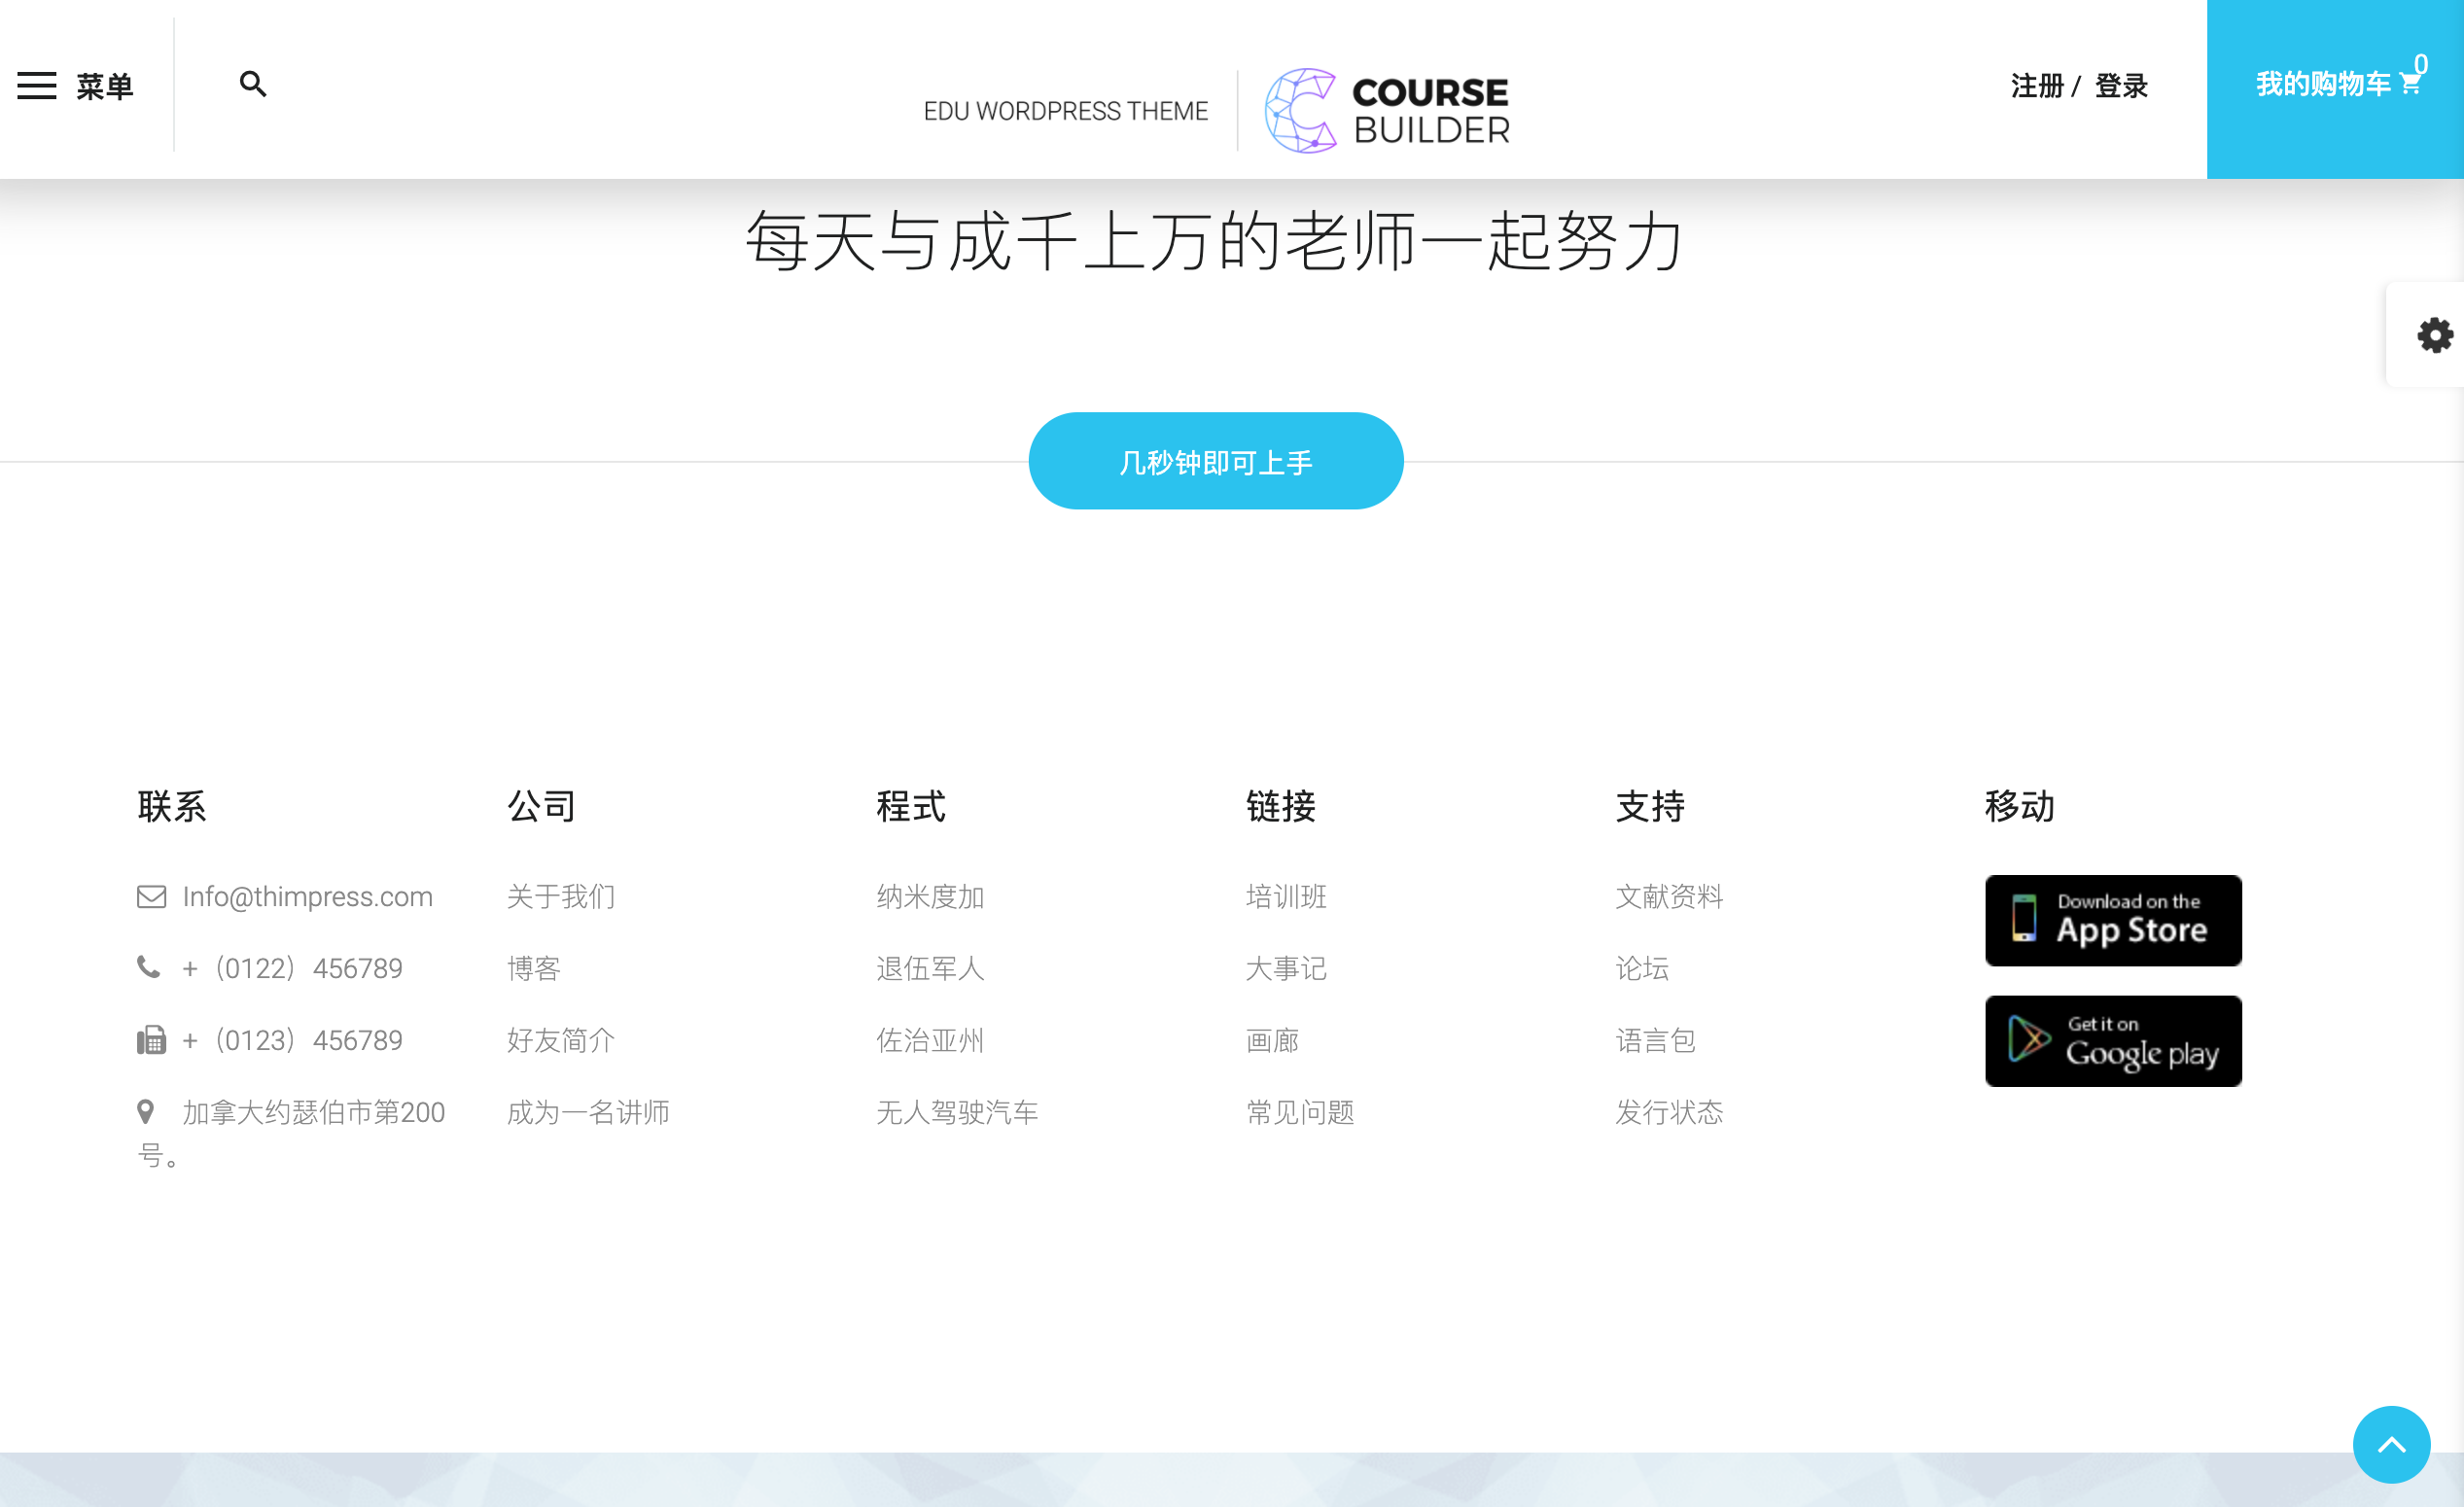 Course Builder | WordPress Lms Theme For Online Courses, Schools & Education 在线课程生成器